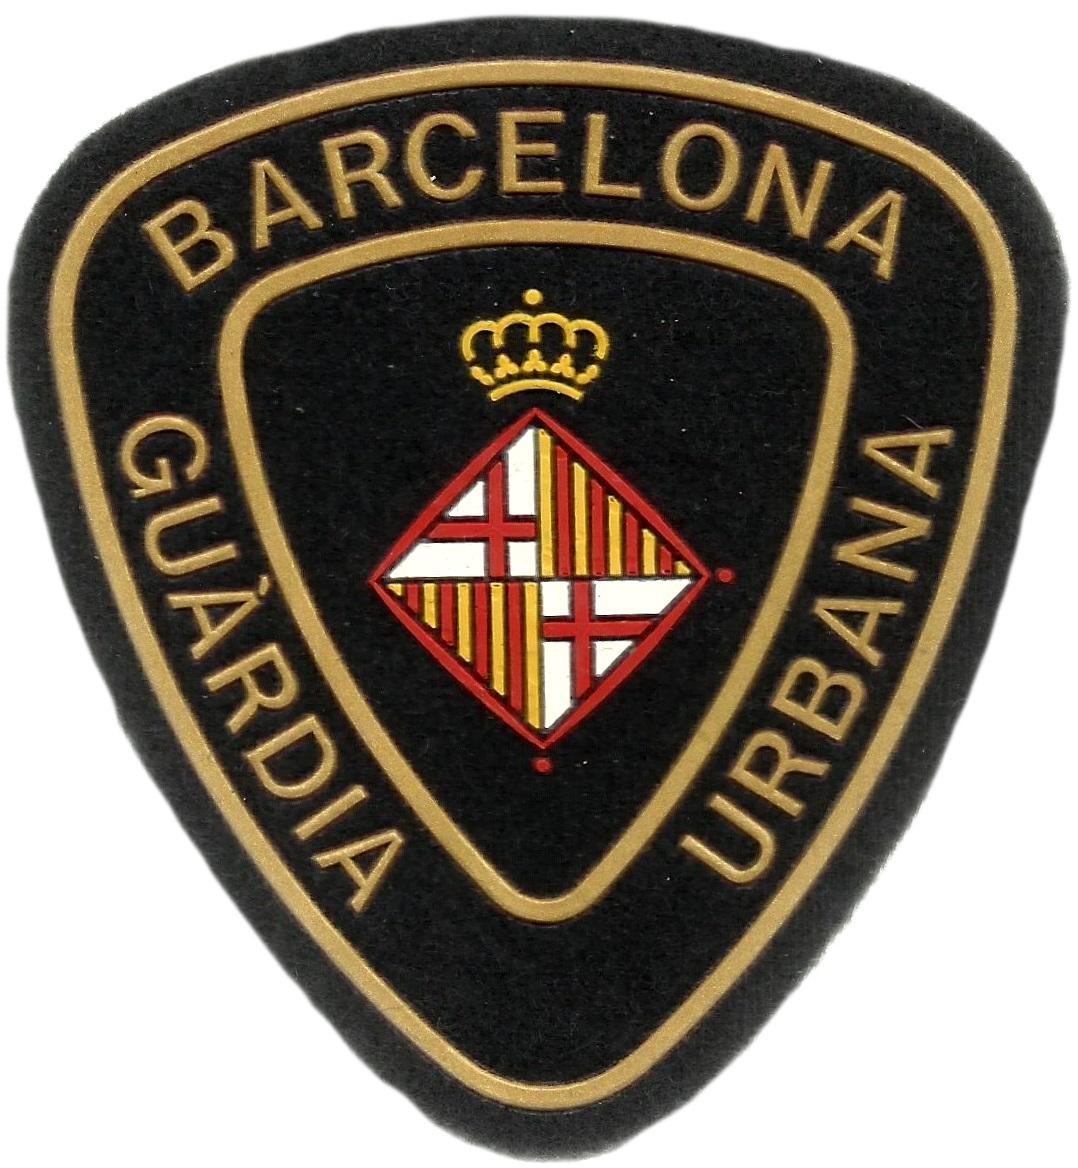 Policía Guardia Urbana de Barcelona parche insignia emblema distintivo